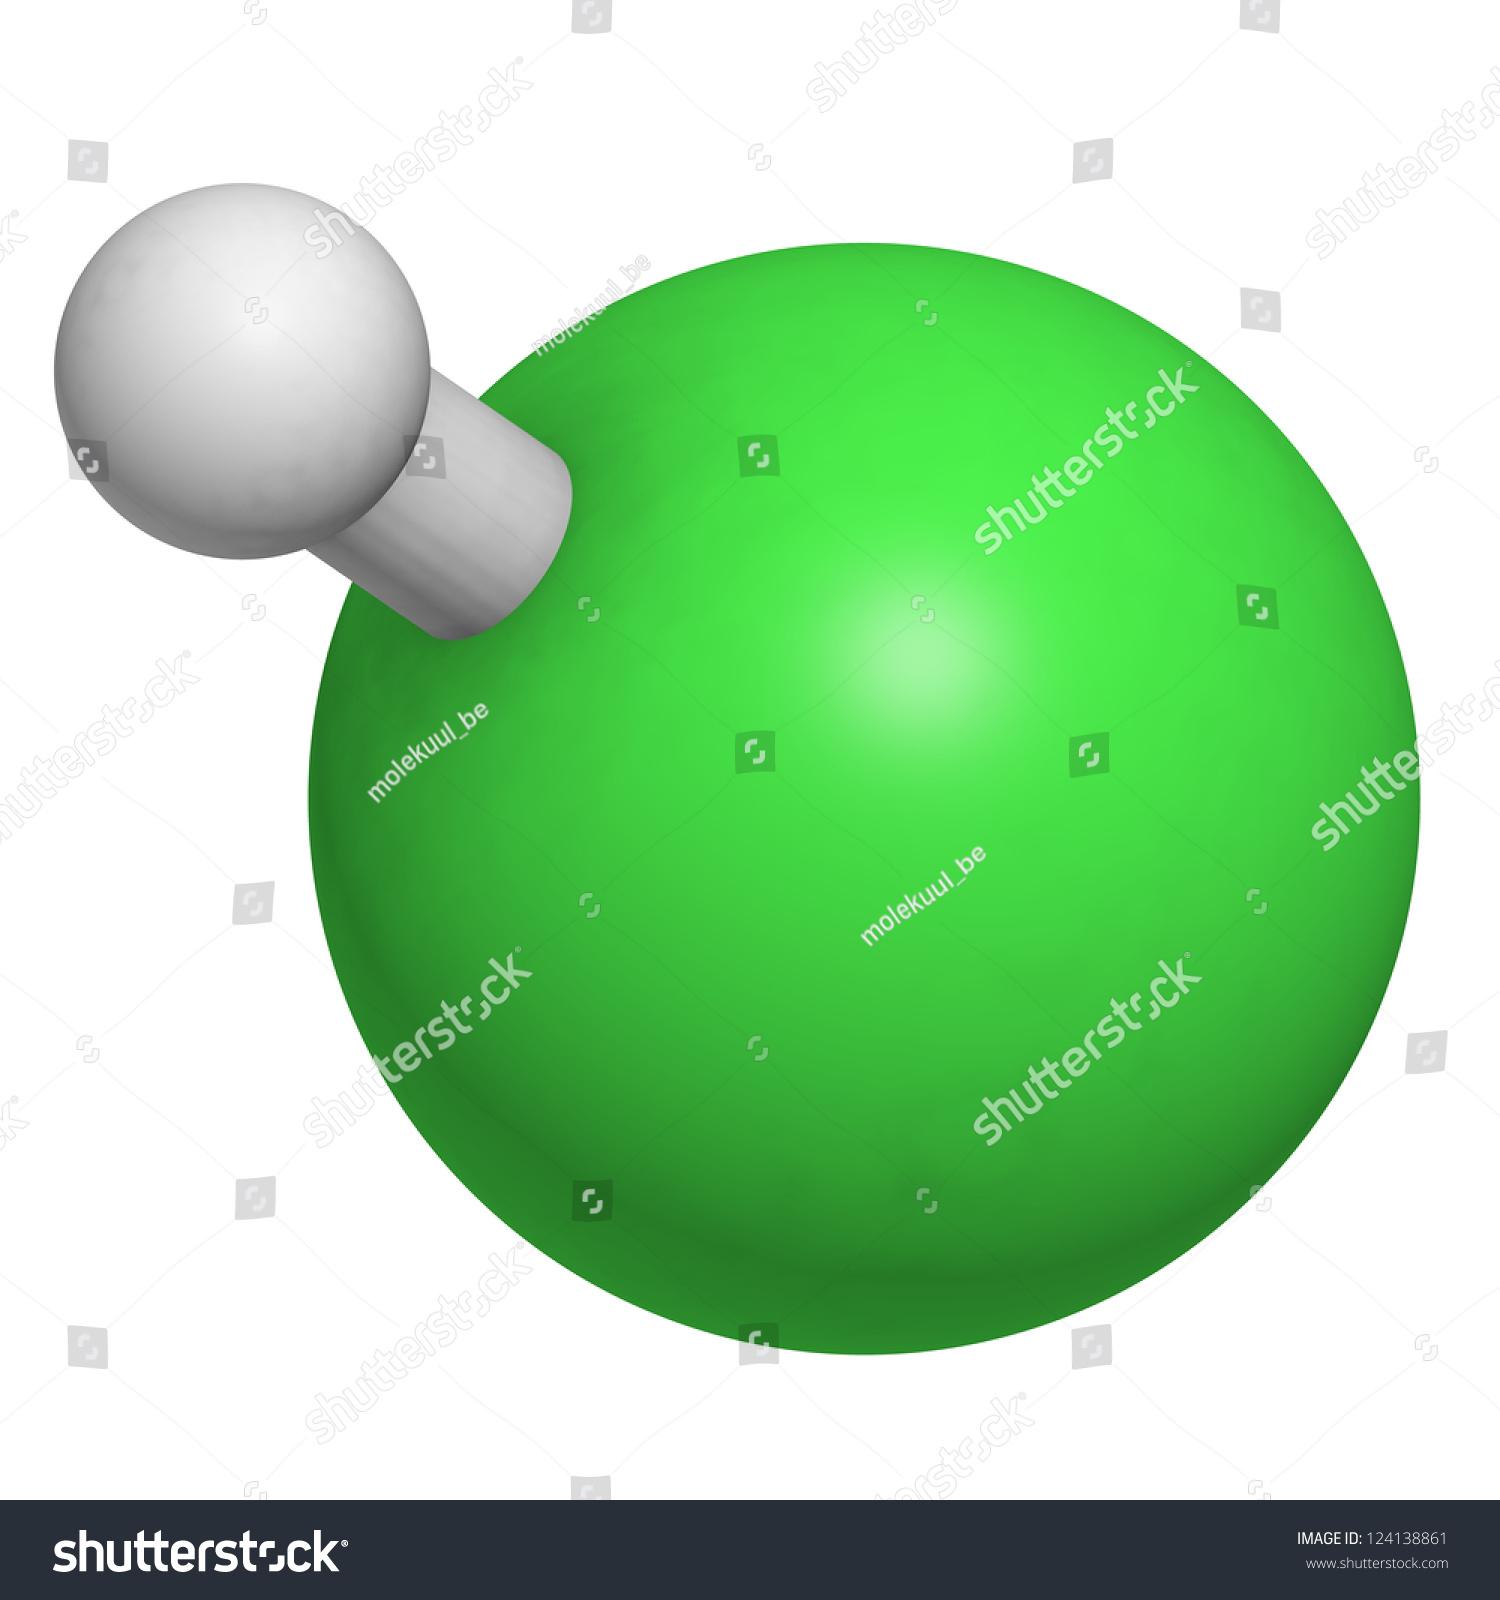 Hydrogen Chloride  Hcl  Molecule  Chemical Structure  Hcl